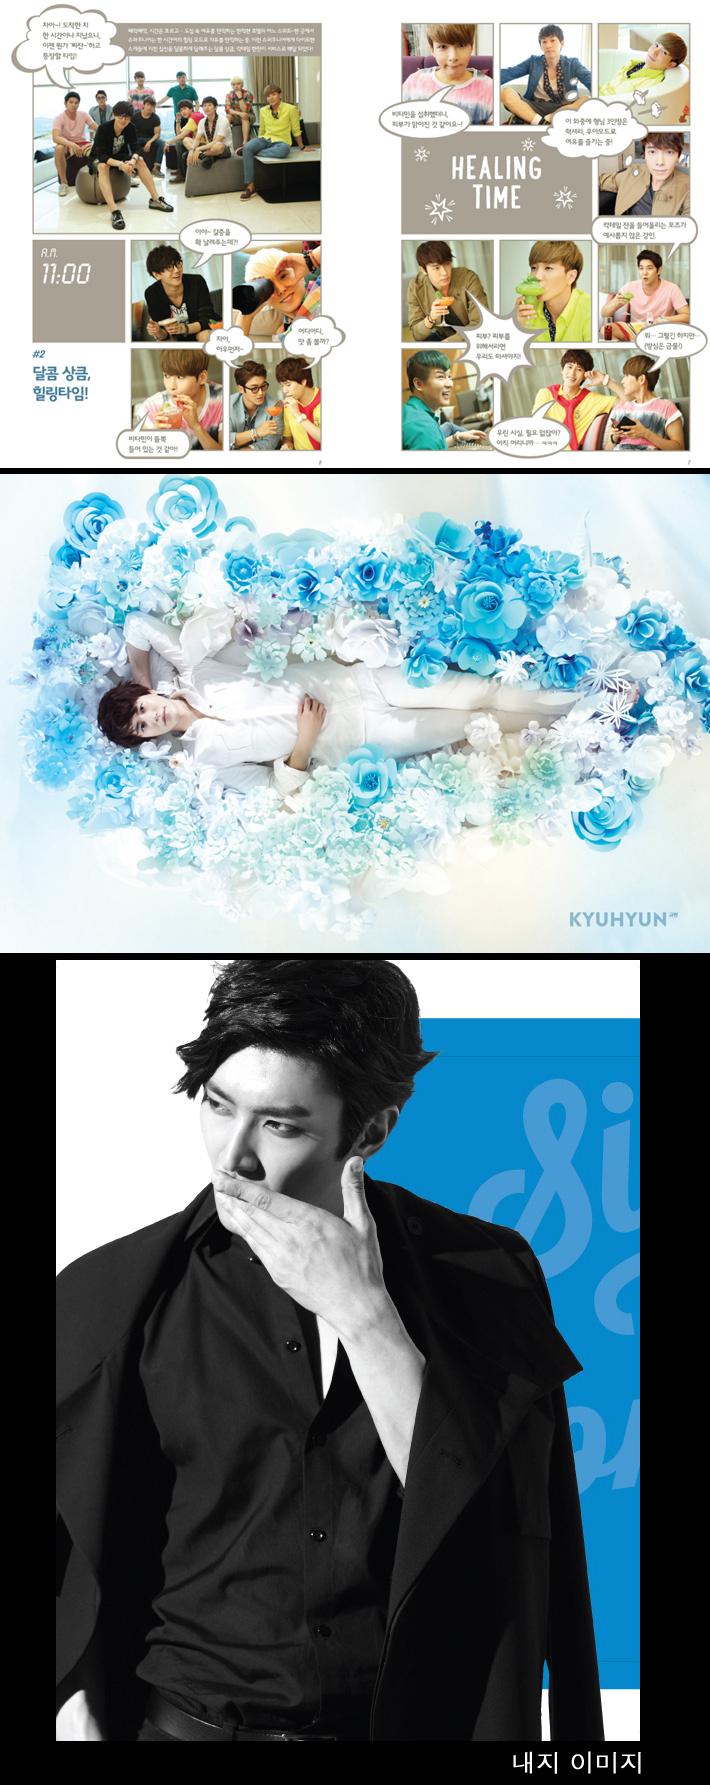 [Super Junior] DVD (TREASURE WITHIN US)+Photo Book All About Super Junior